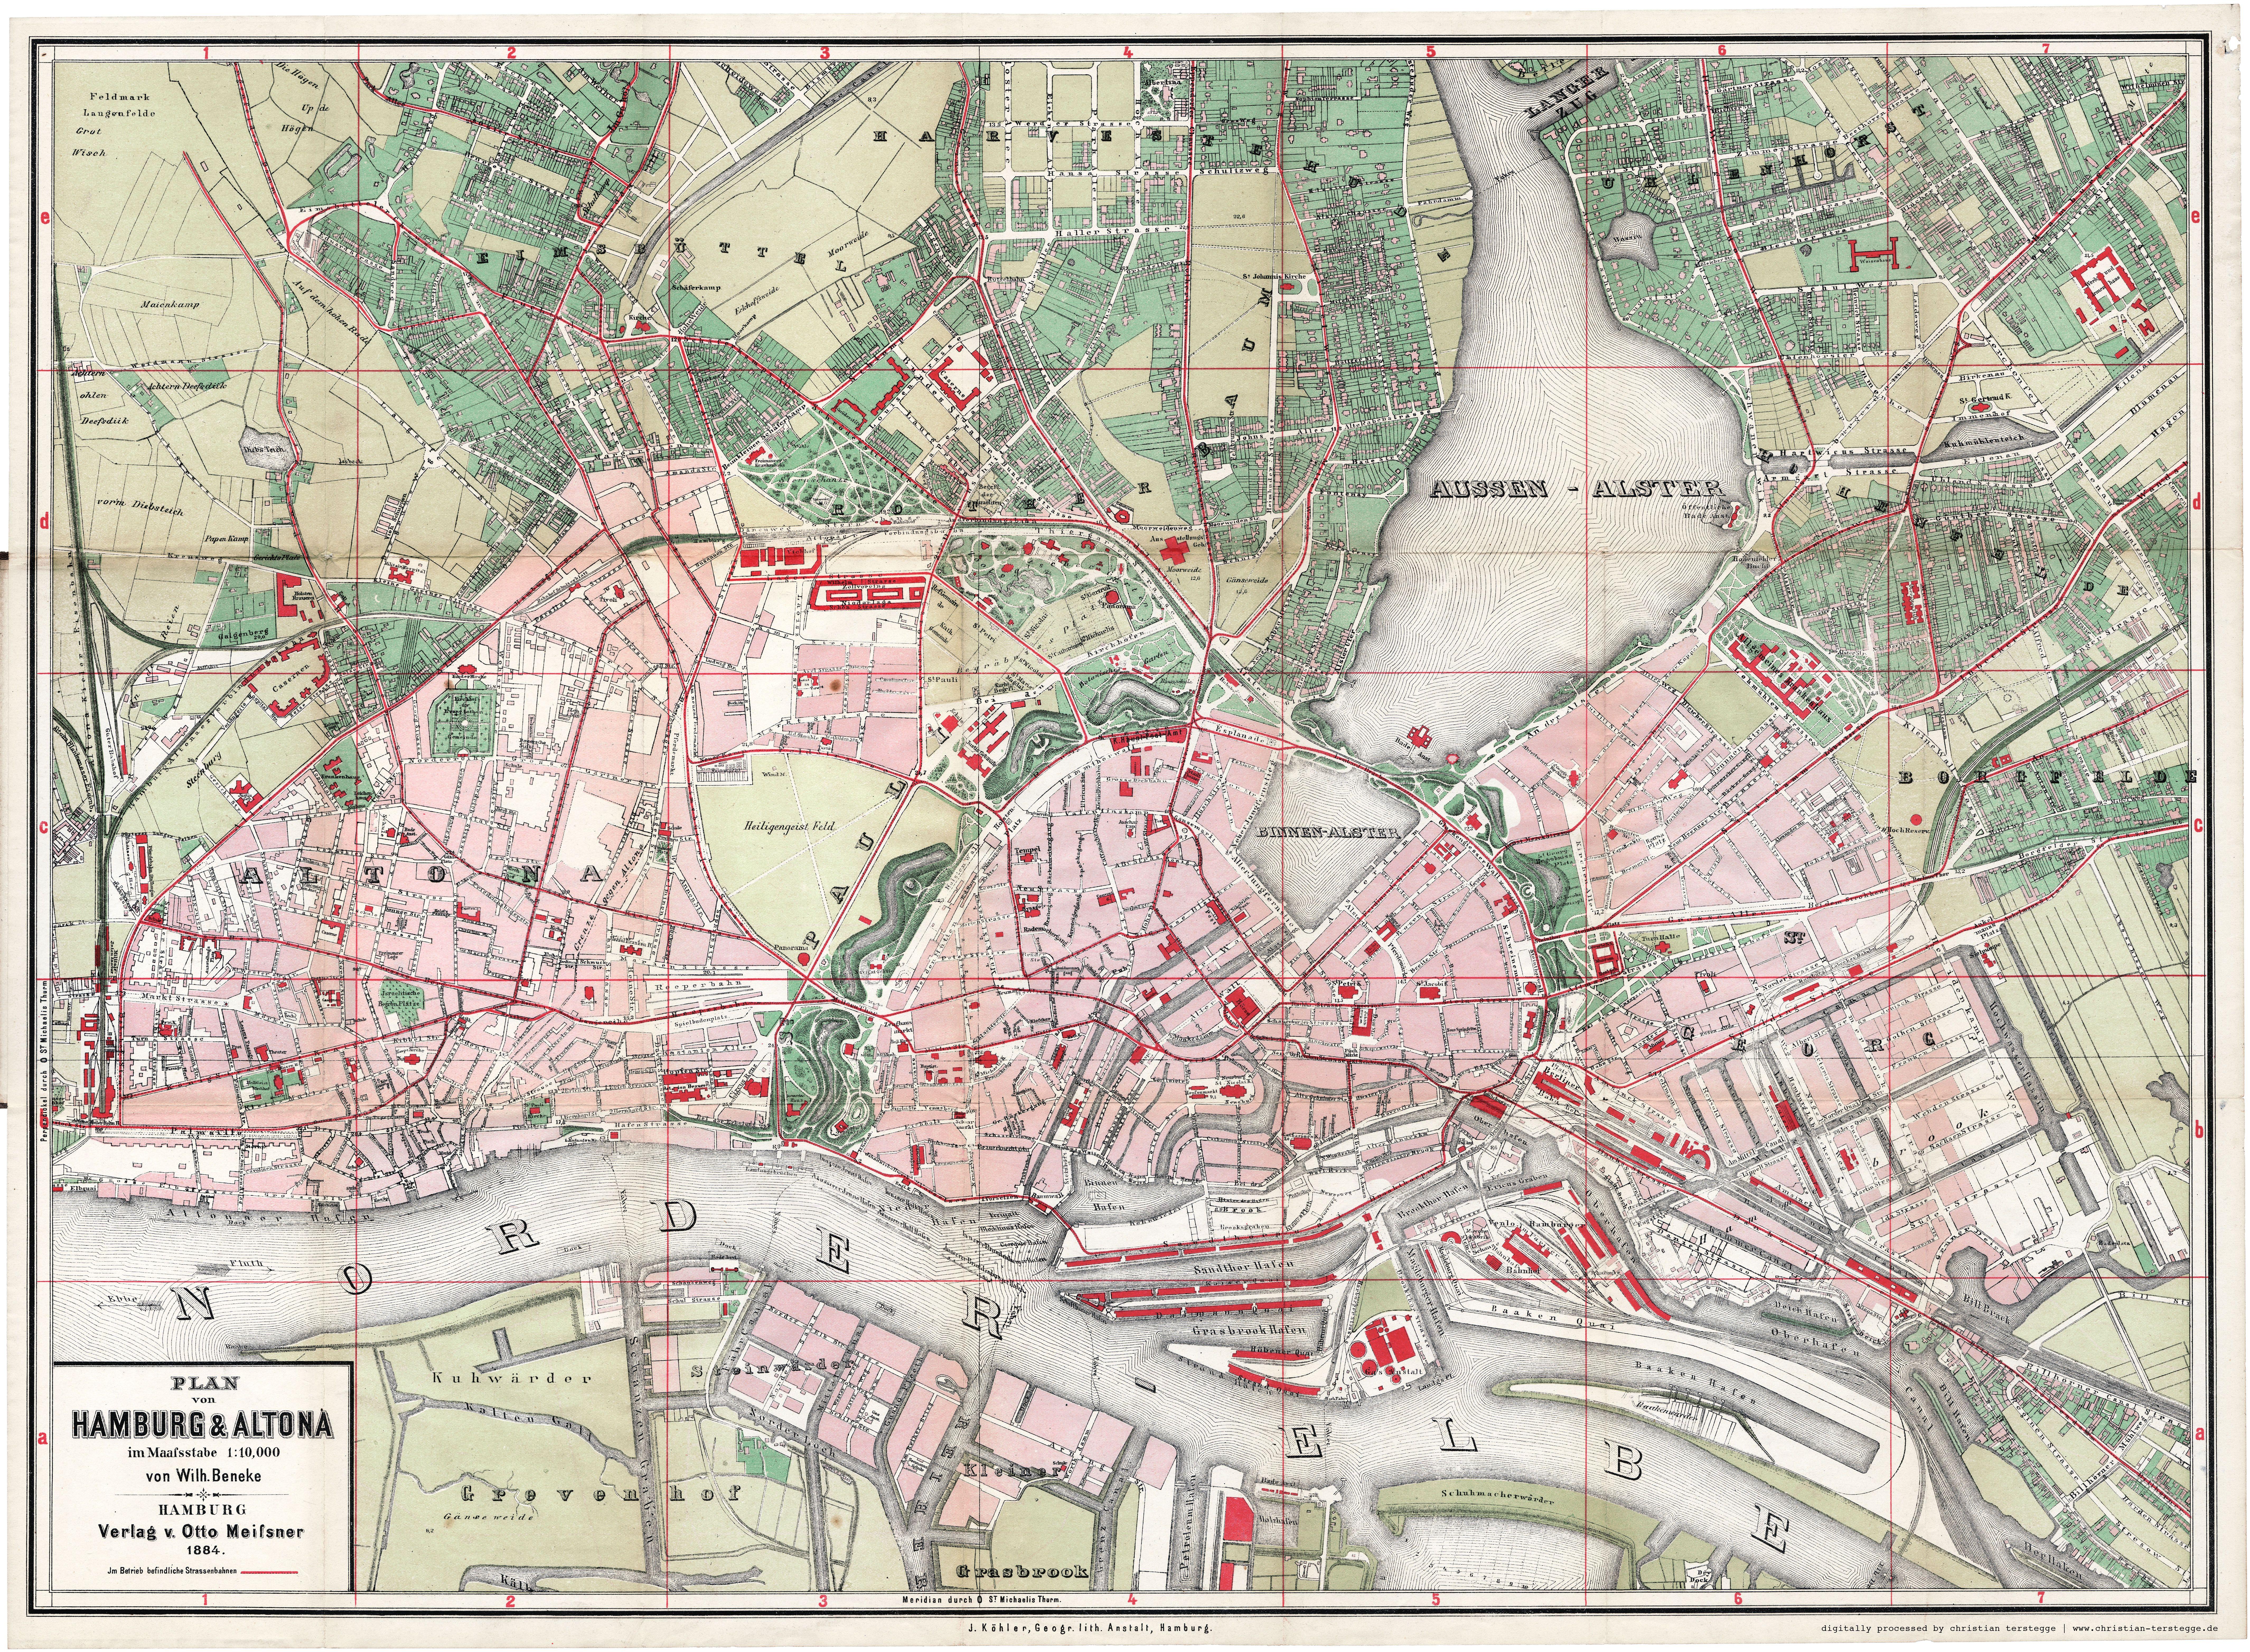 Karte Hamburg Altona 1884 Hamburg Altona Hamburg Illustrierte